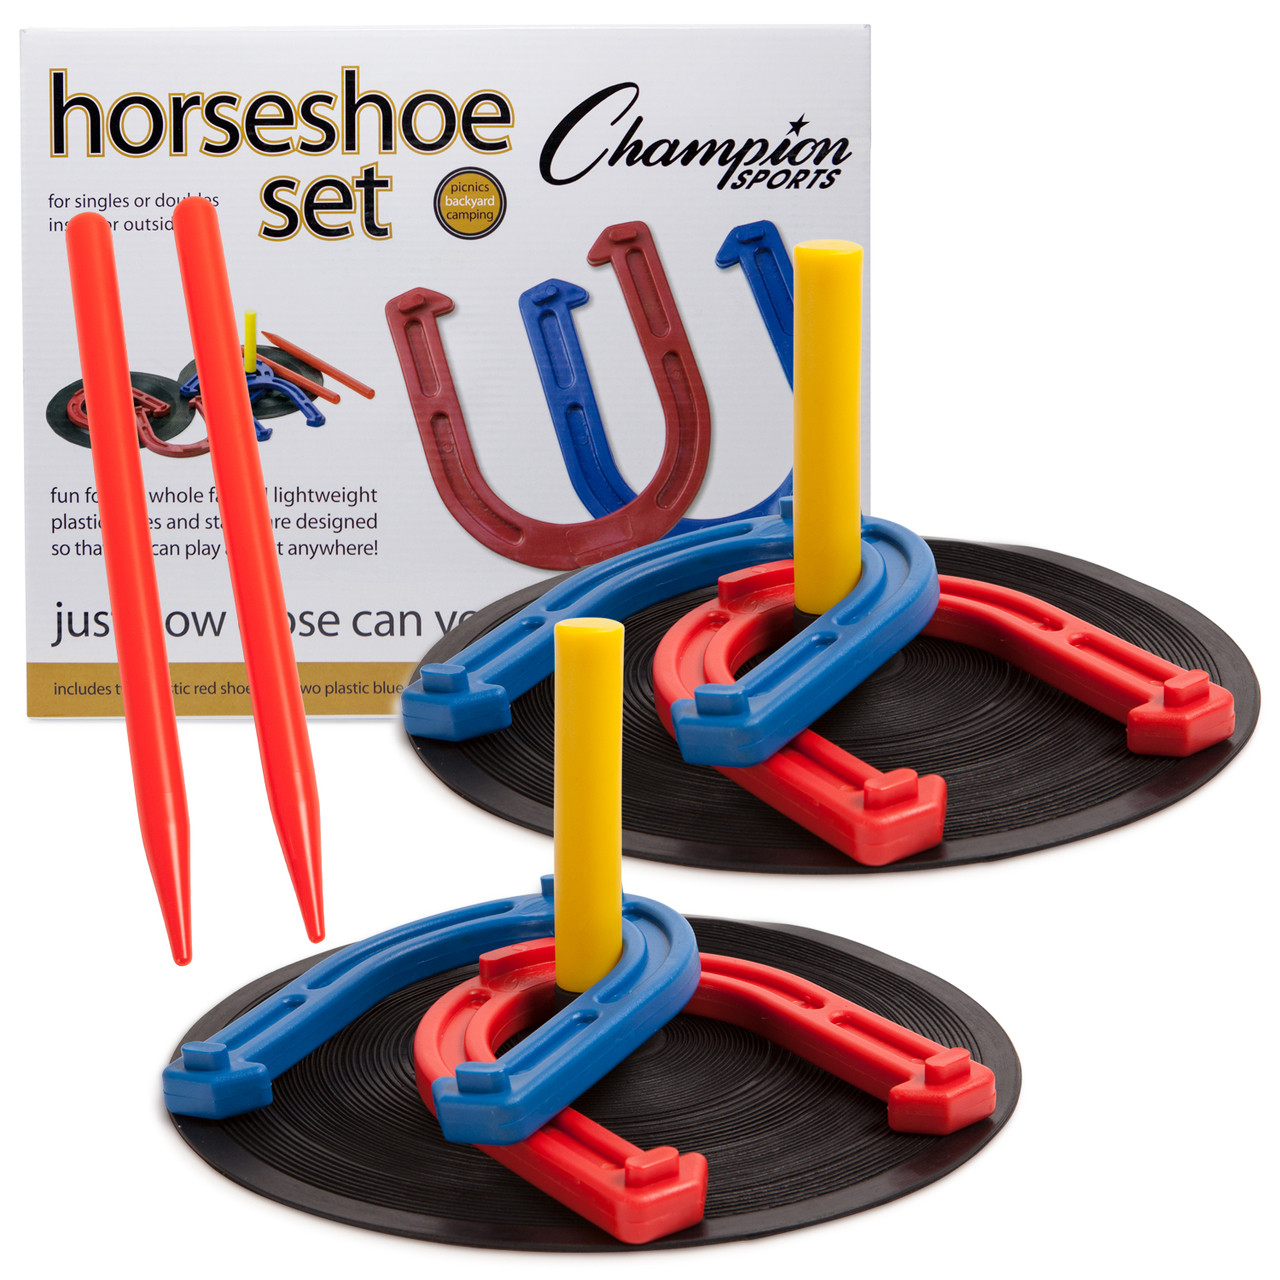 Champion Sports Indoor / Outdoor Horseshoe Set